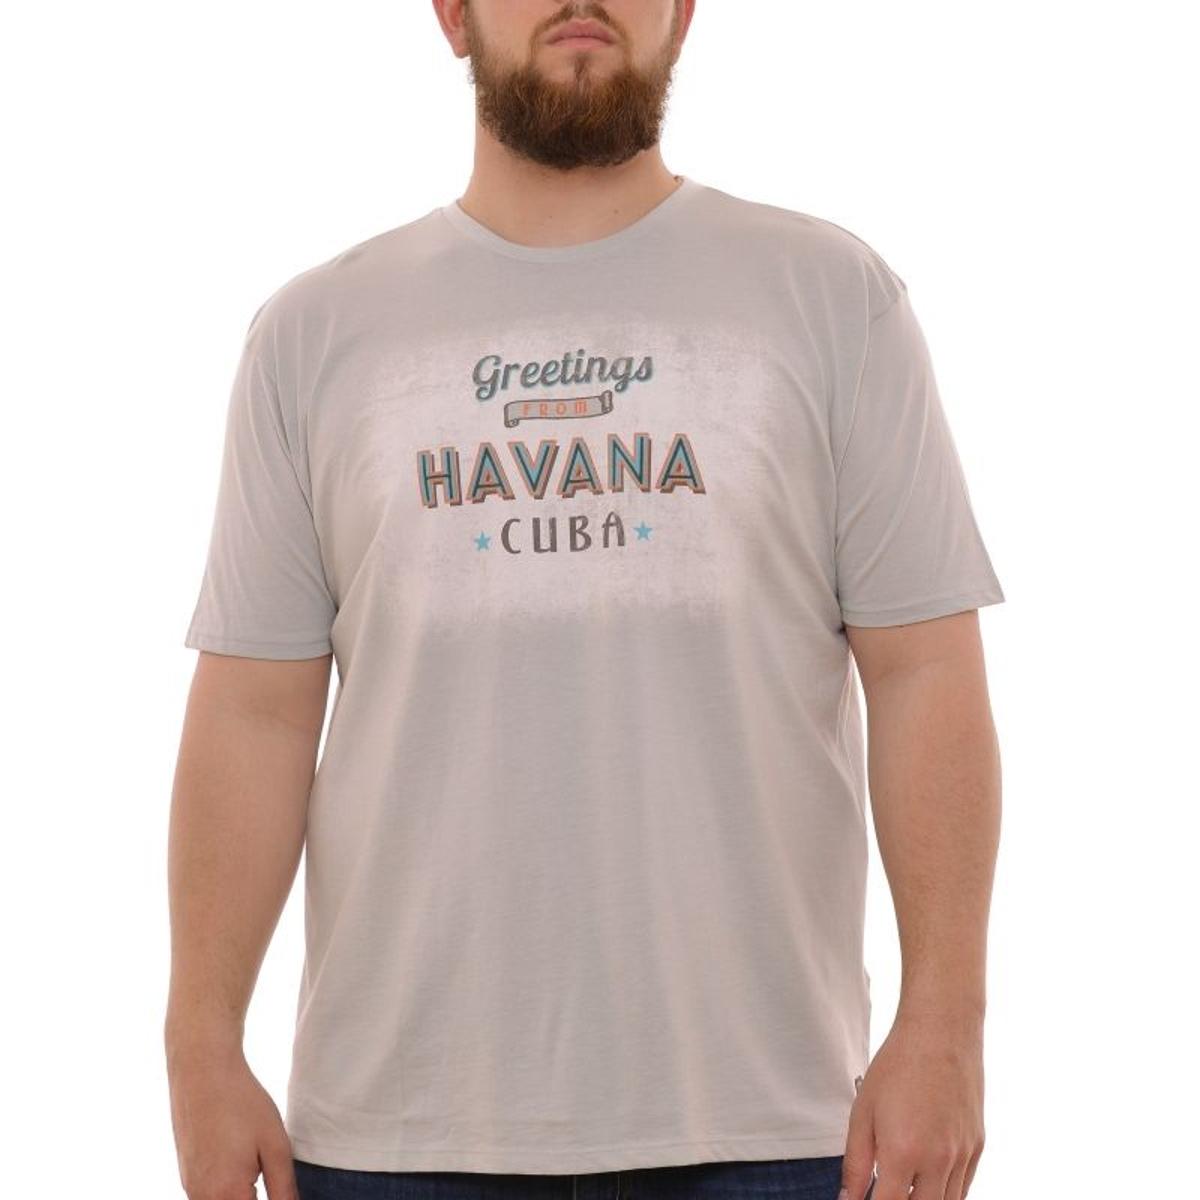 T-shirt manches courtes greige havana